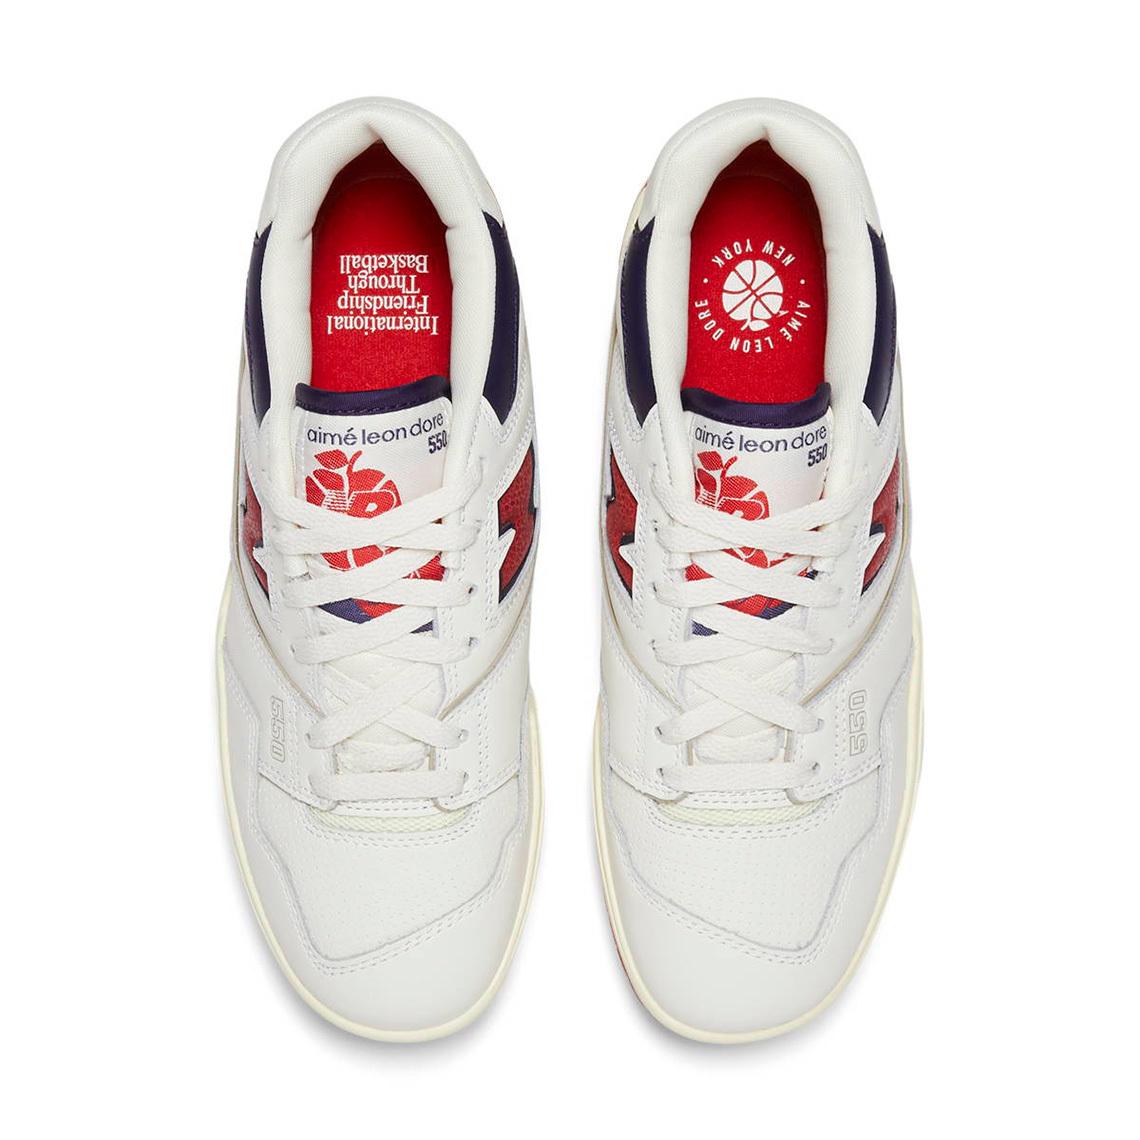 Aimé Leon Dore x New Balance 550 ''White/Navy/Red'' - BB550A3